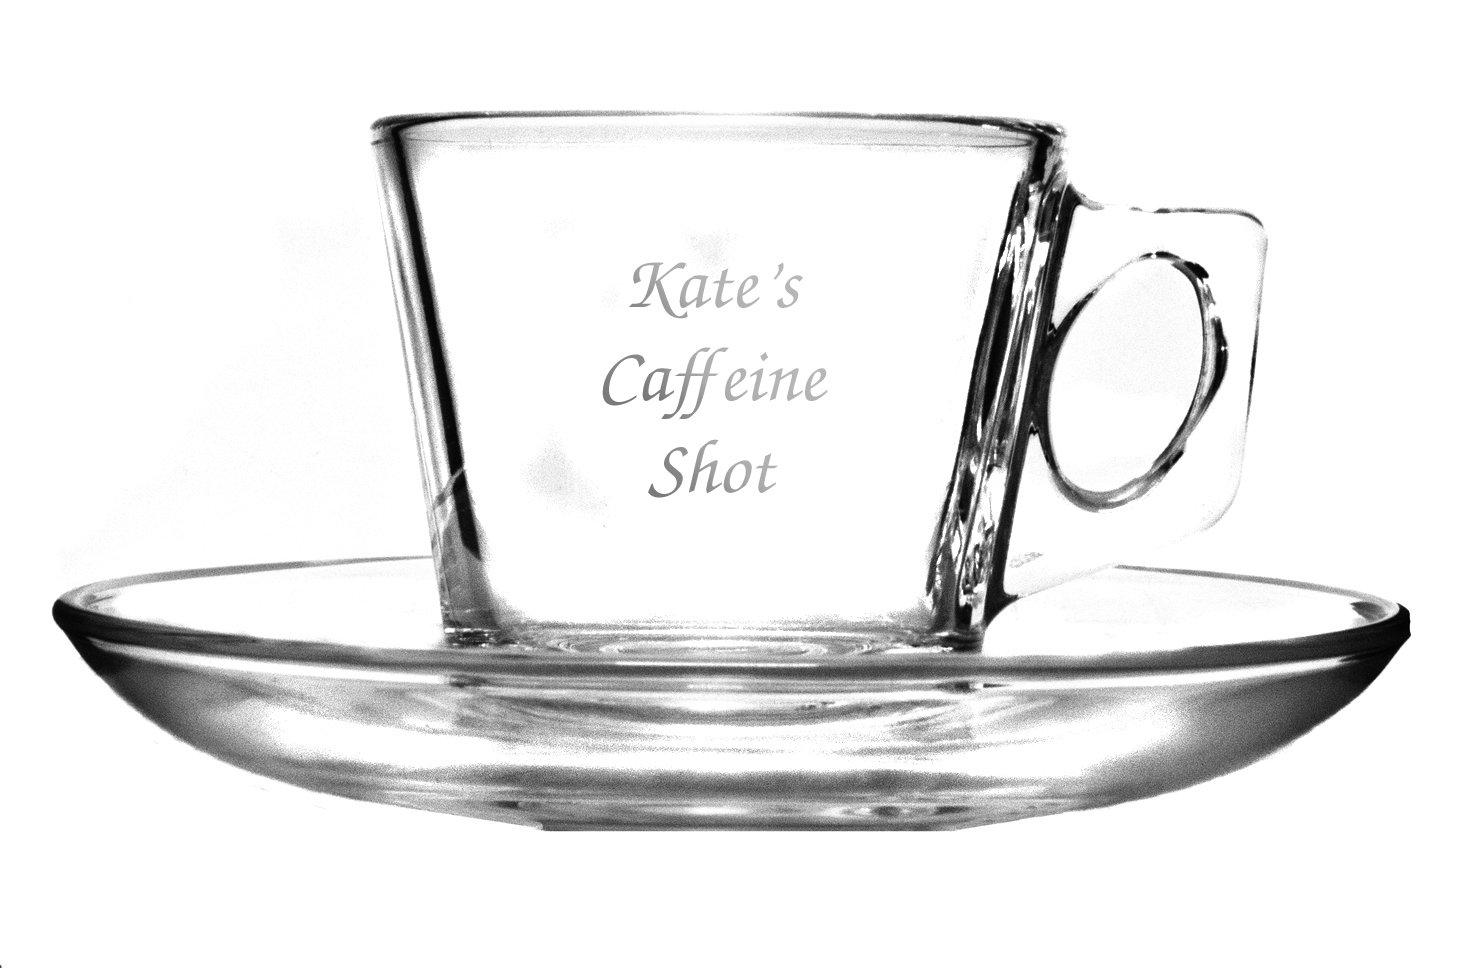 Glass espresso coffee cups uk - Espresso Americano Glass Coffee Mugs Personalised 200ml Glass Cappuccino Latte Americano Espresso Coffee Cup And